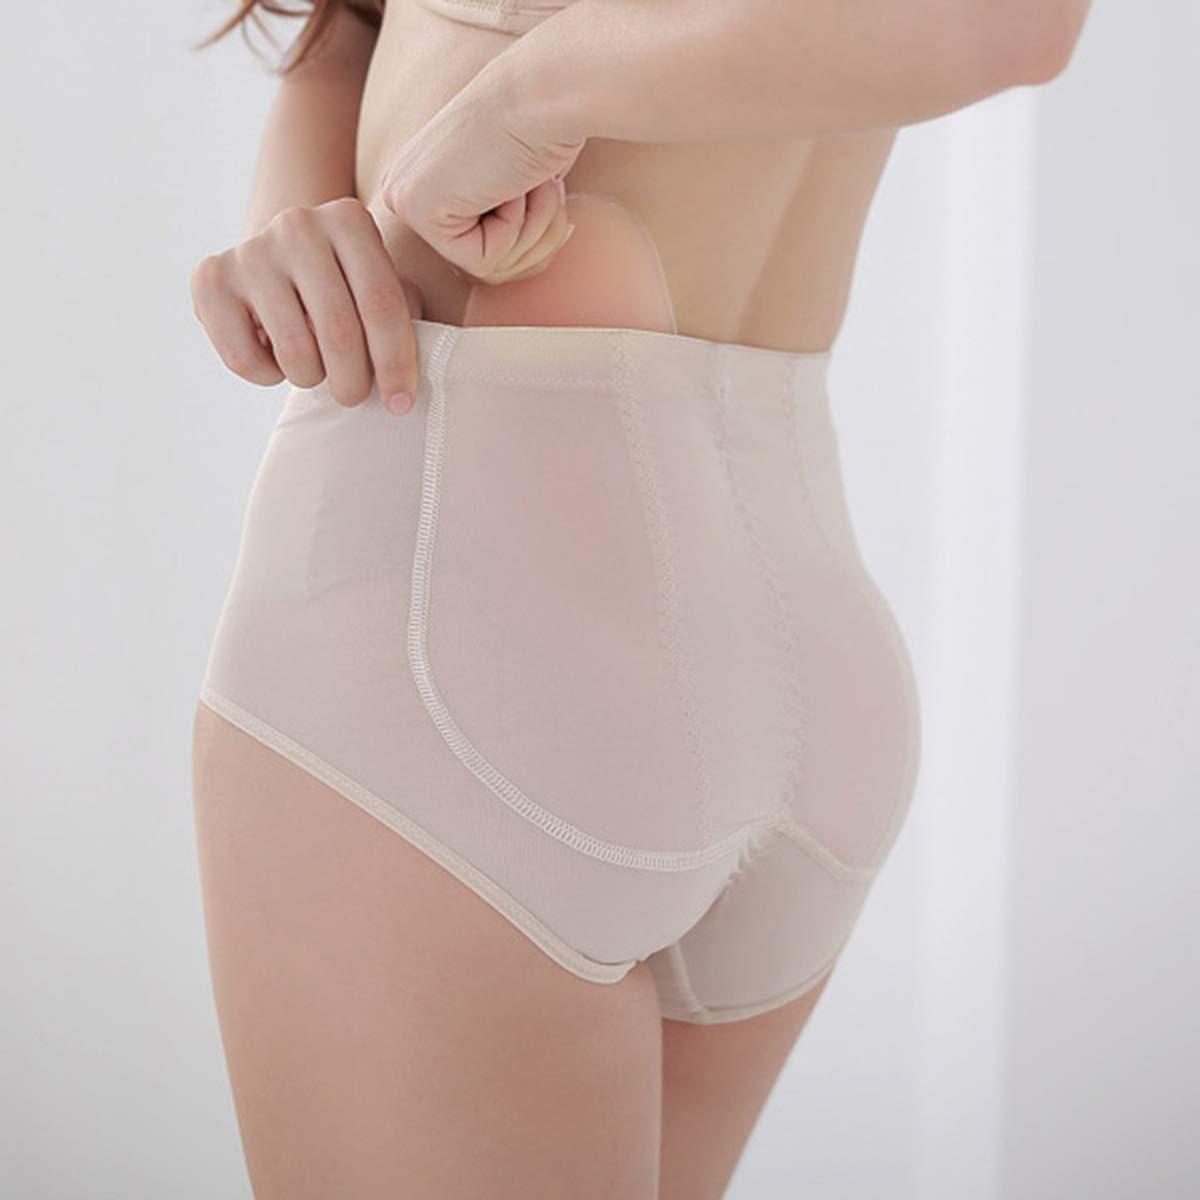 iEFiEL 1 Pair Silicone Butt Pads Buttocks Enhancer Padding Women Push up Panties